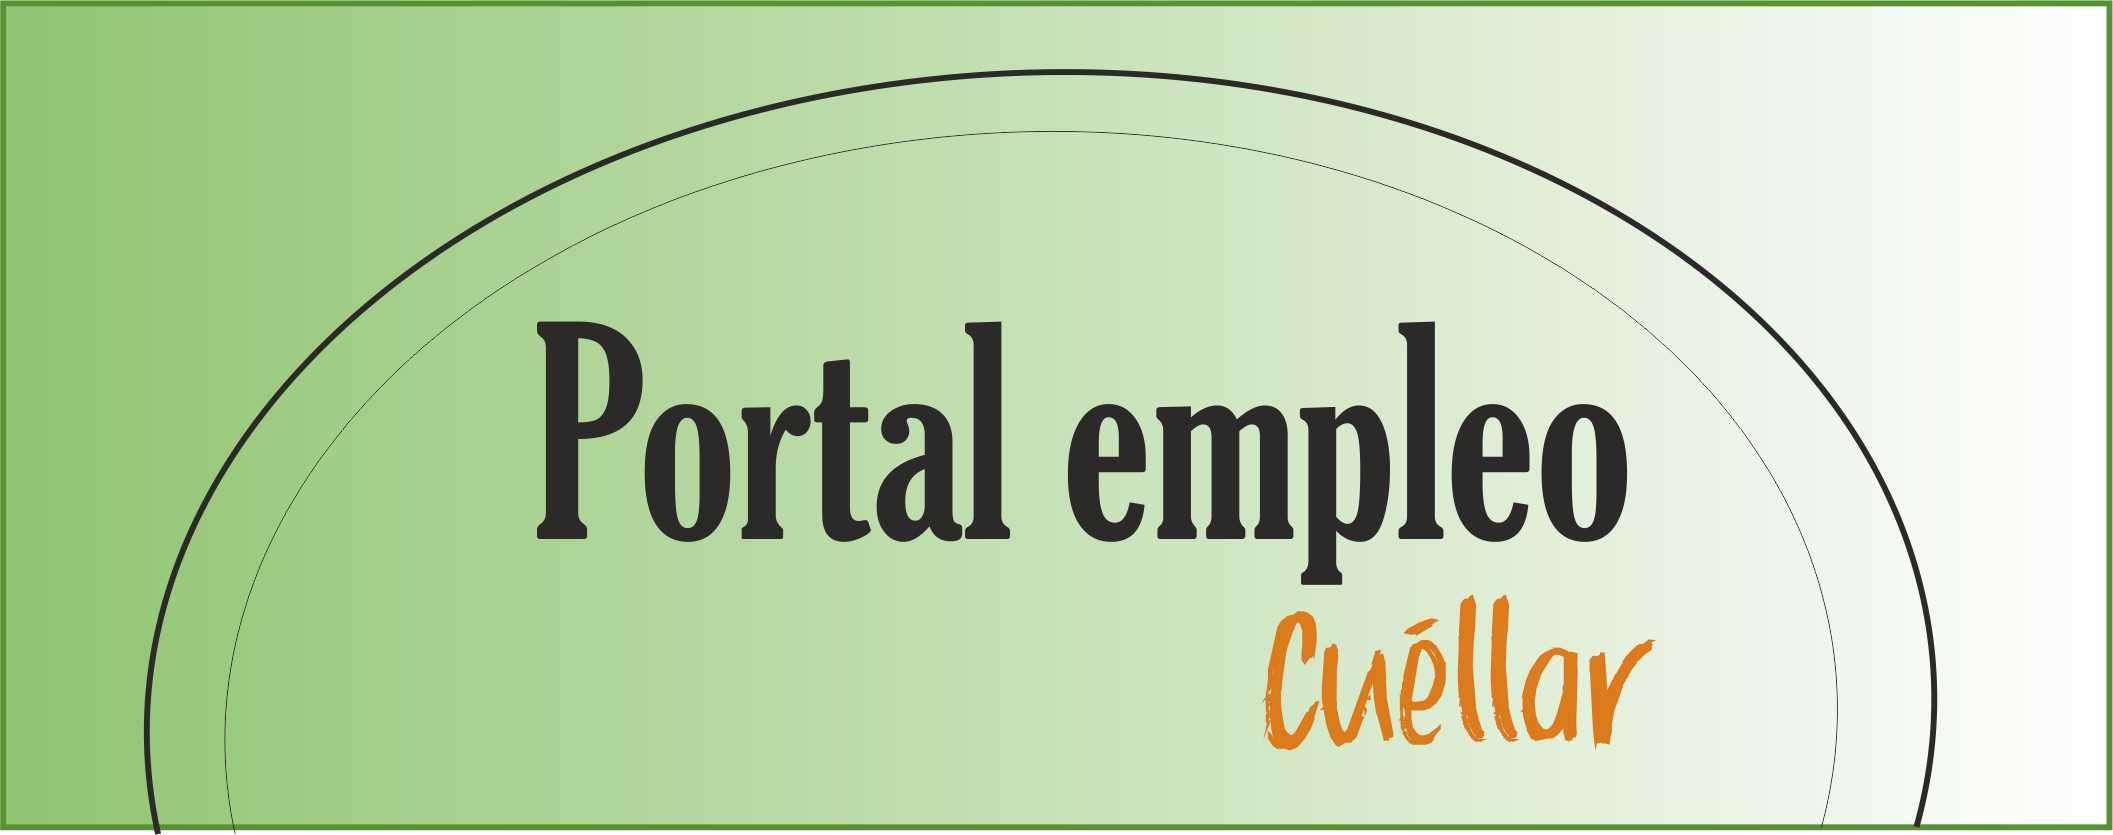 Poortal de empleo